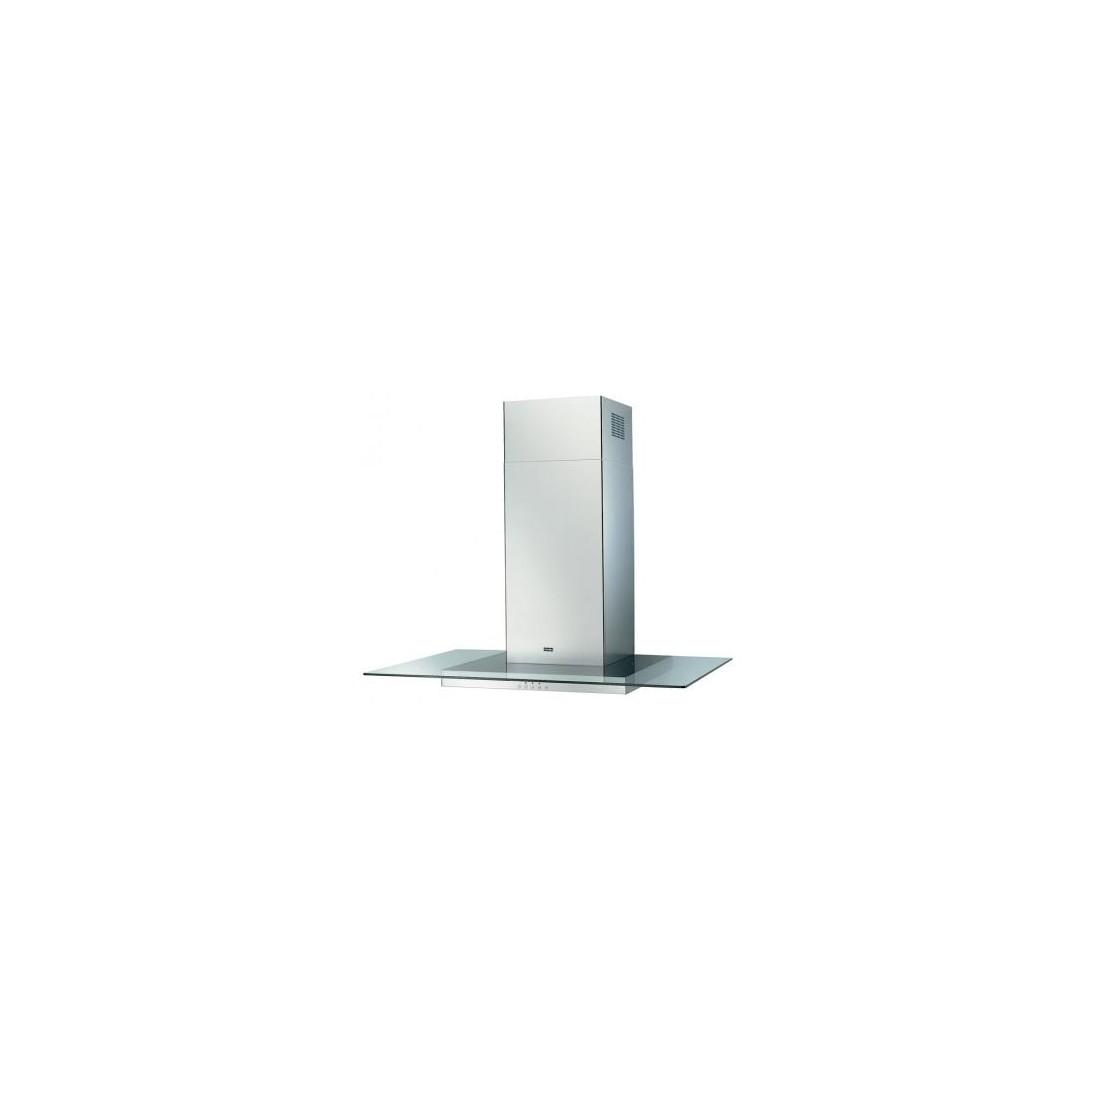 Garų surinktuvas Franke, Glass Linear FGL 905-P XS